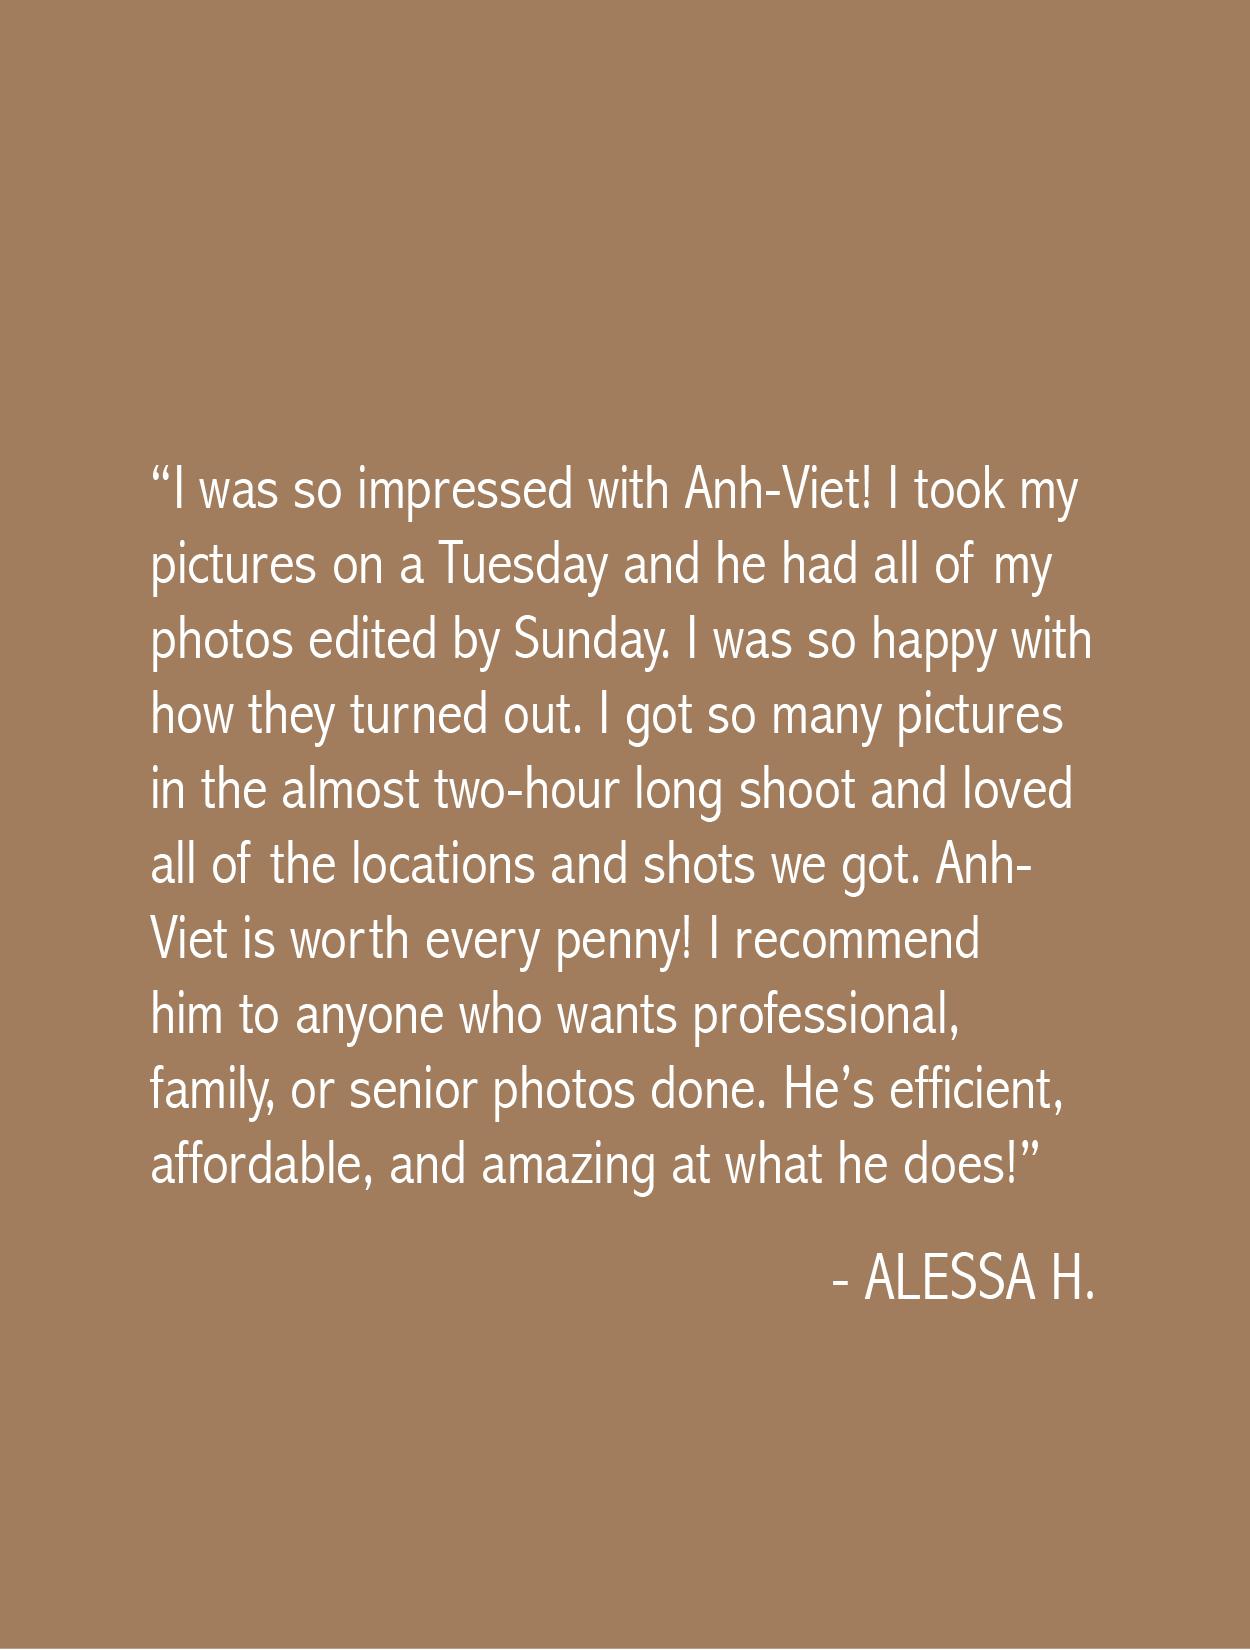 Alessa Testimonial Anh-Viet Dinh Photography